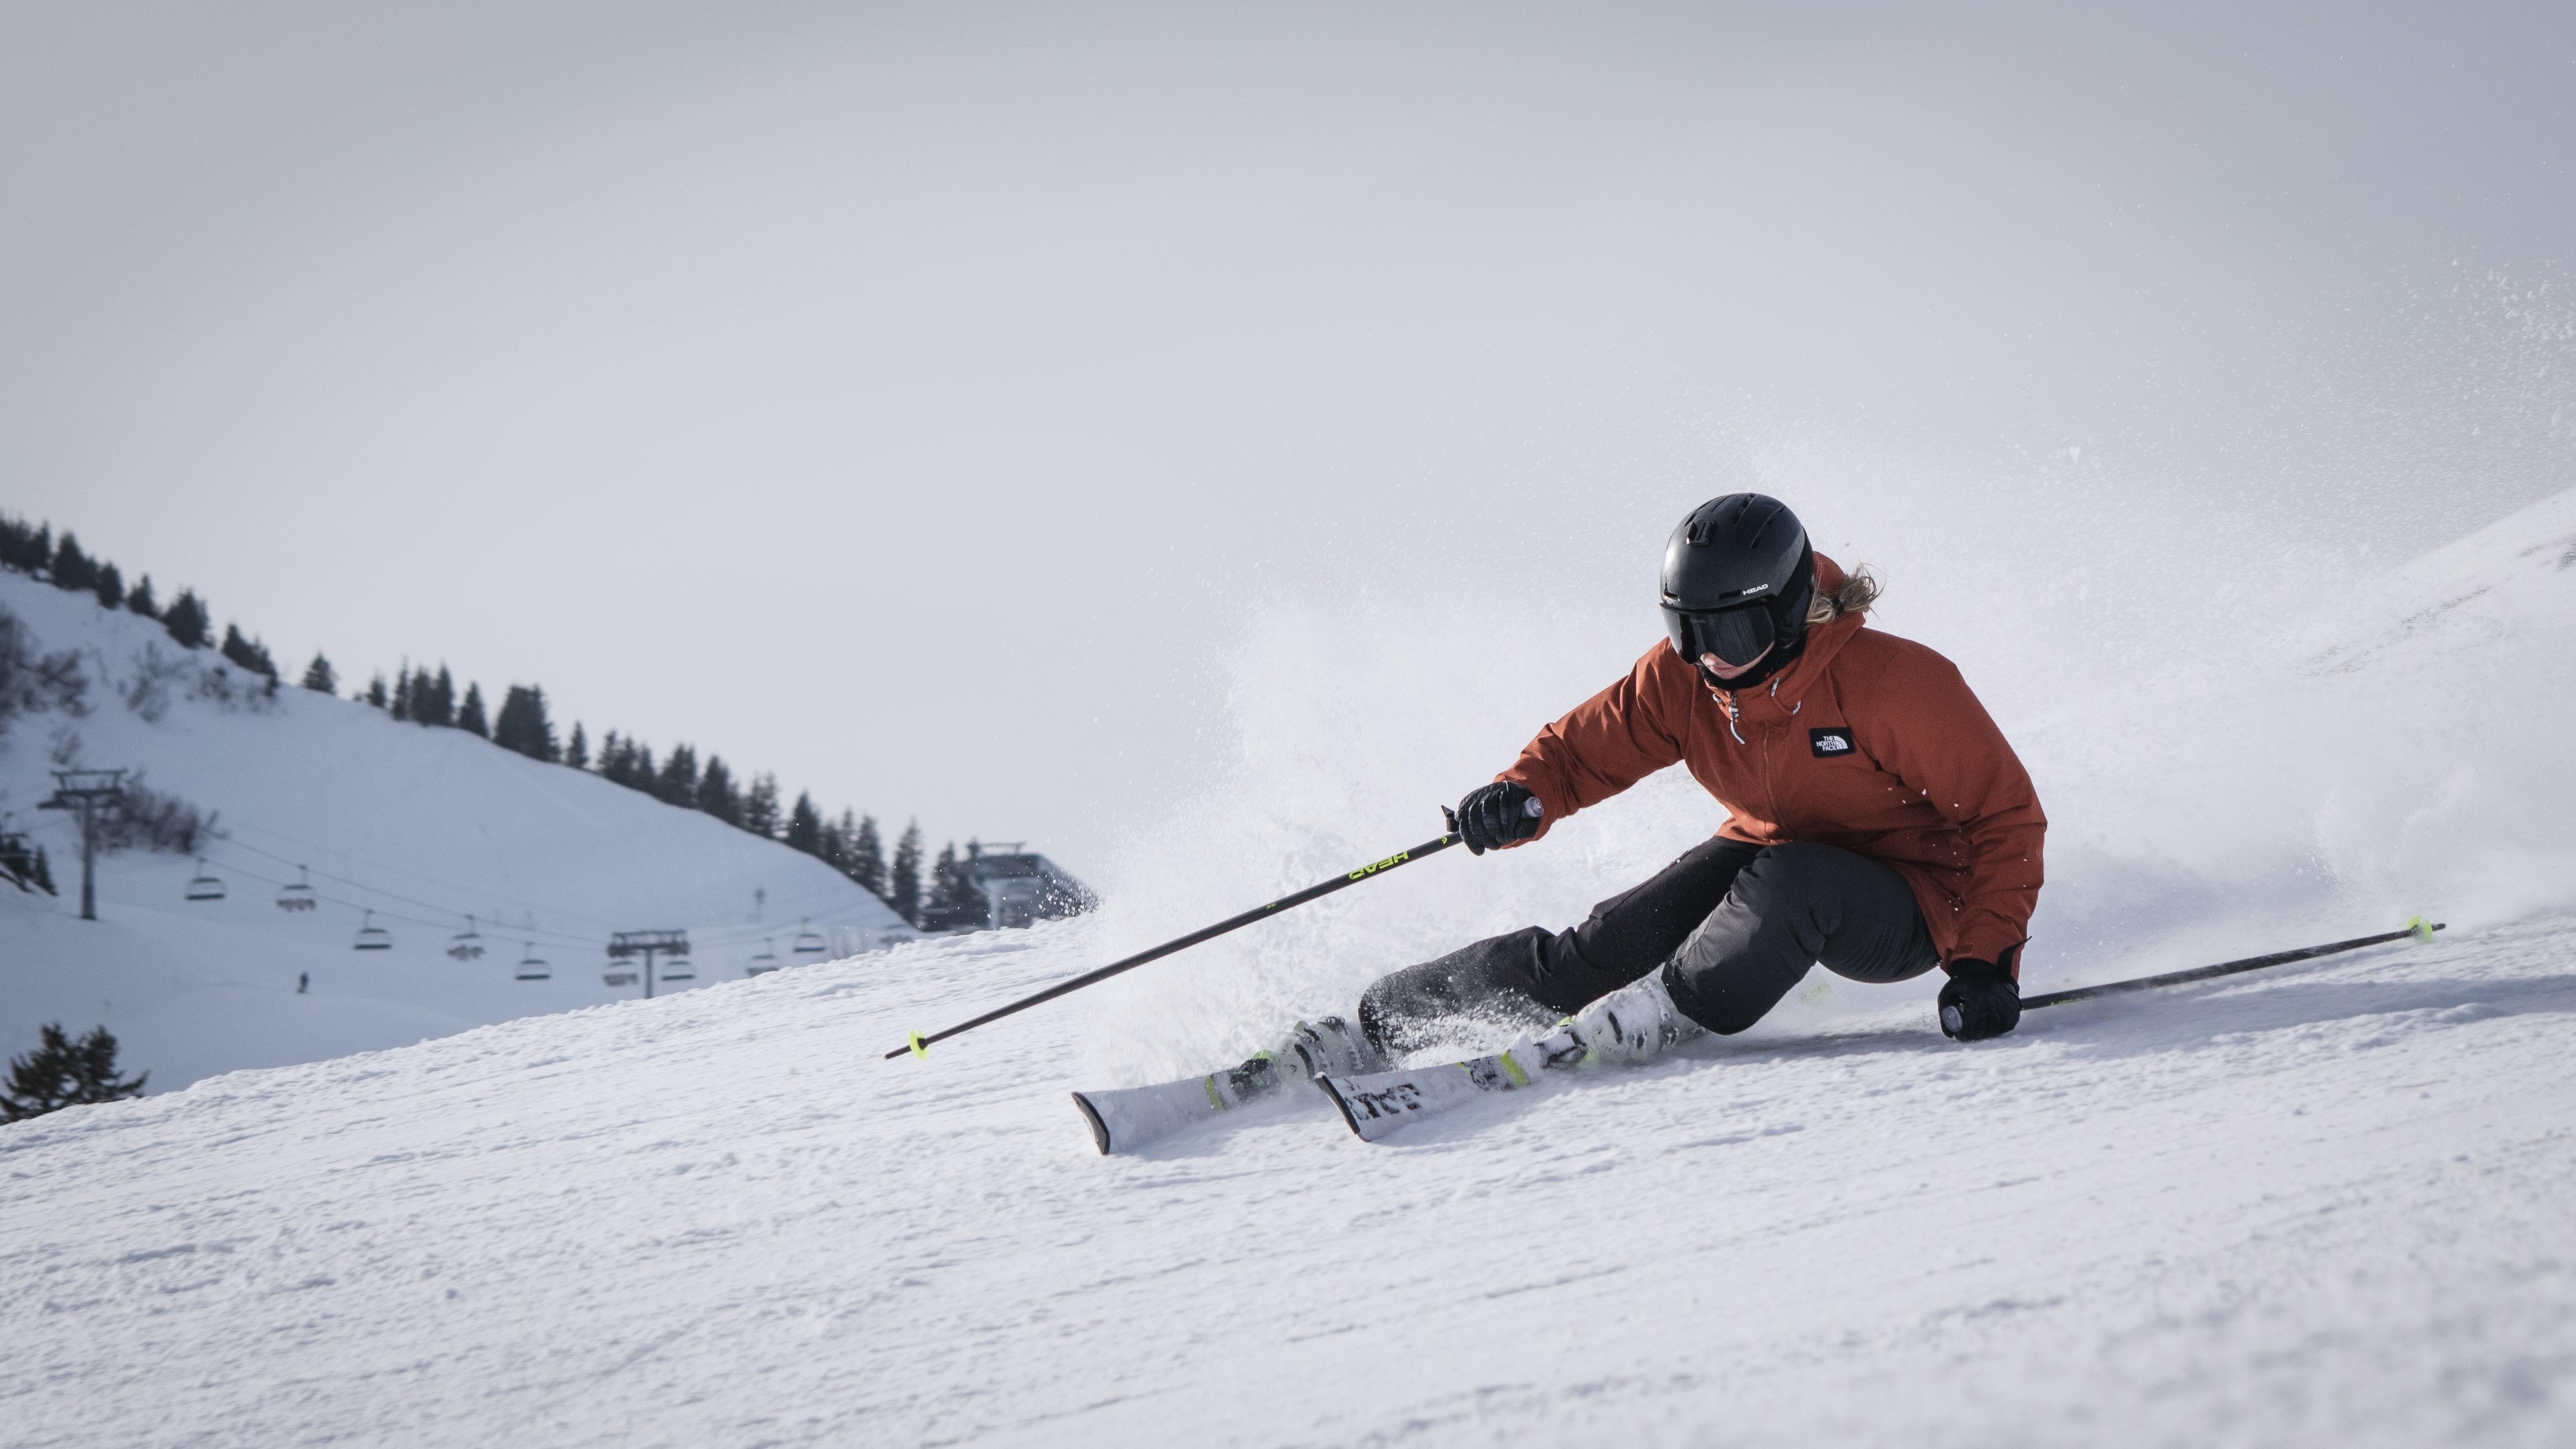 AdventureEXP: Rocky Mountain Adventure in Aspen, Colorado – Winter & Spring Semester